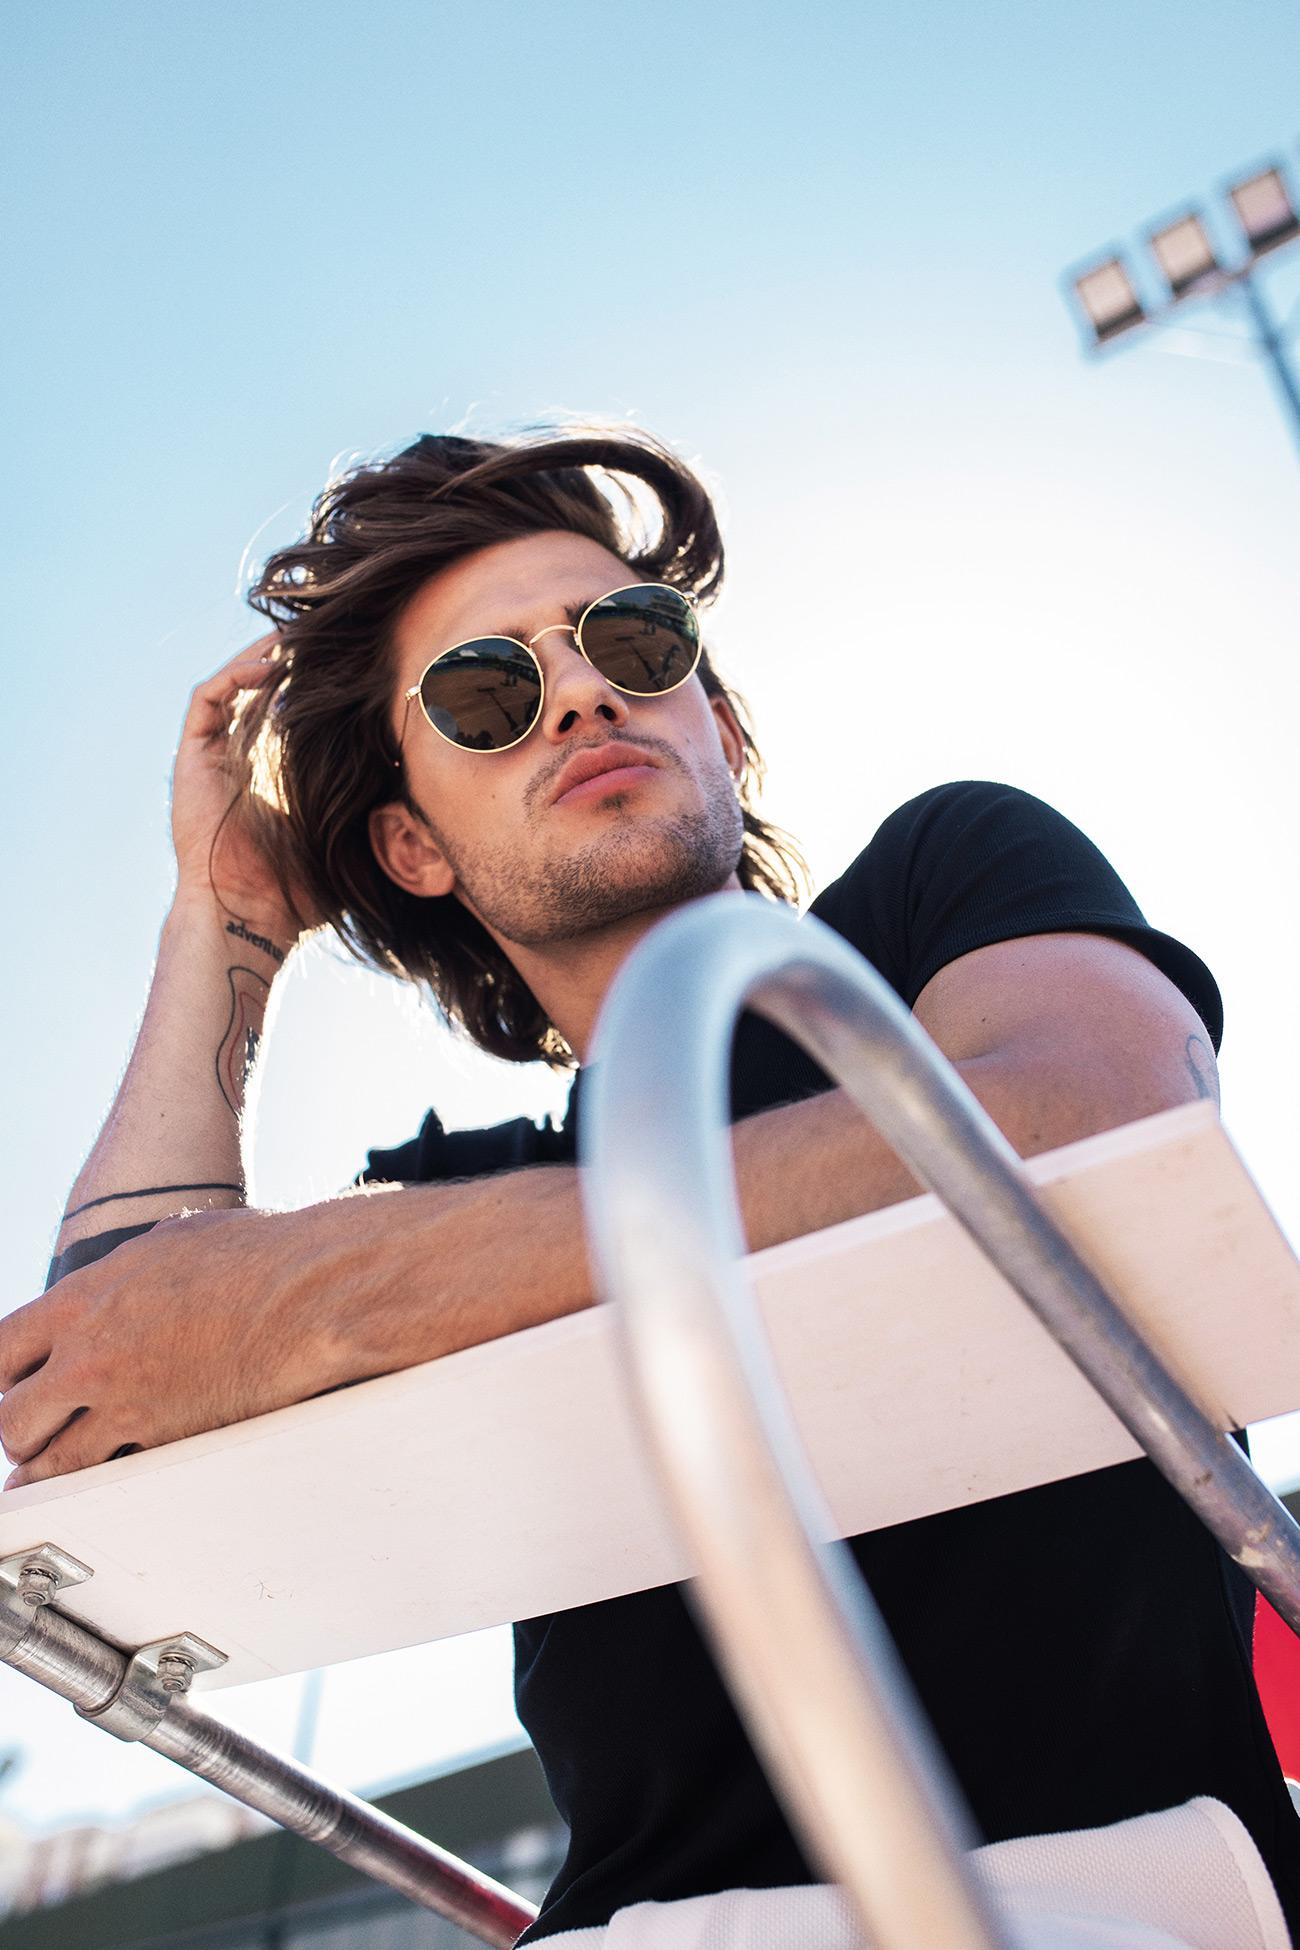 Hokana Sunglasses Murcia